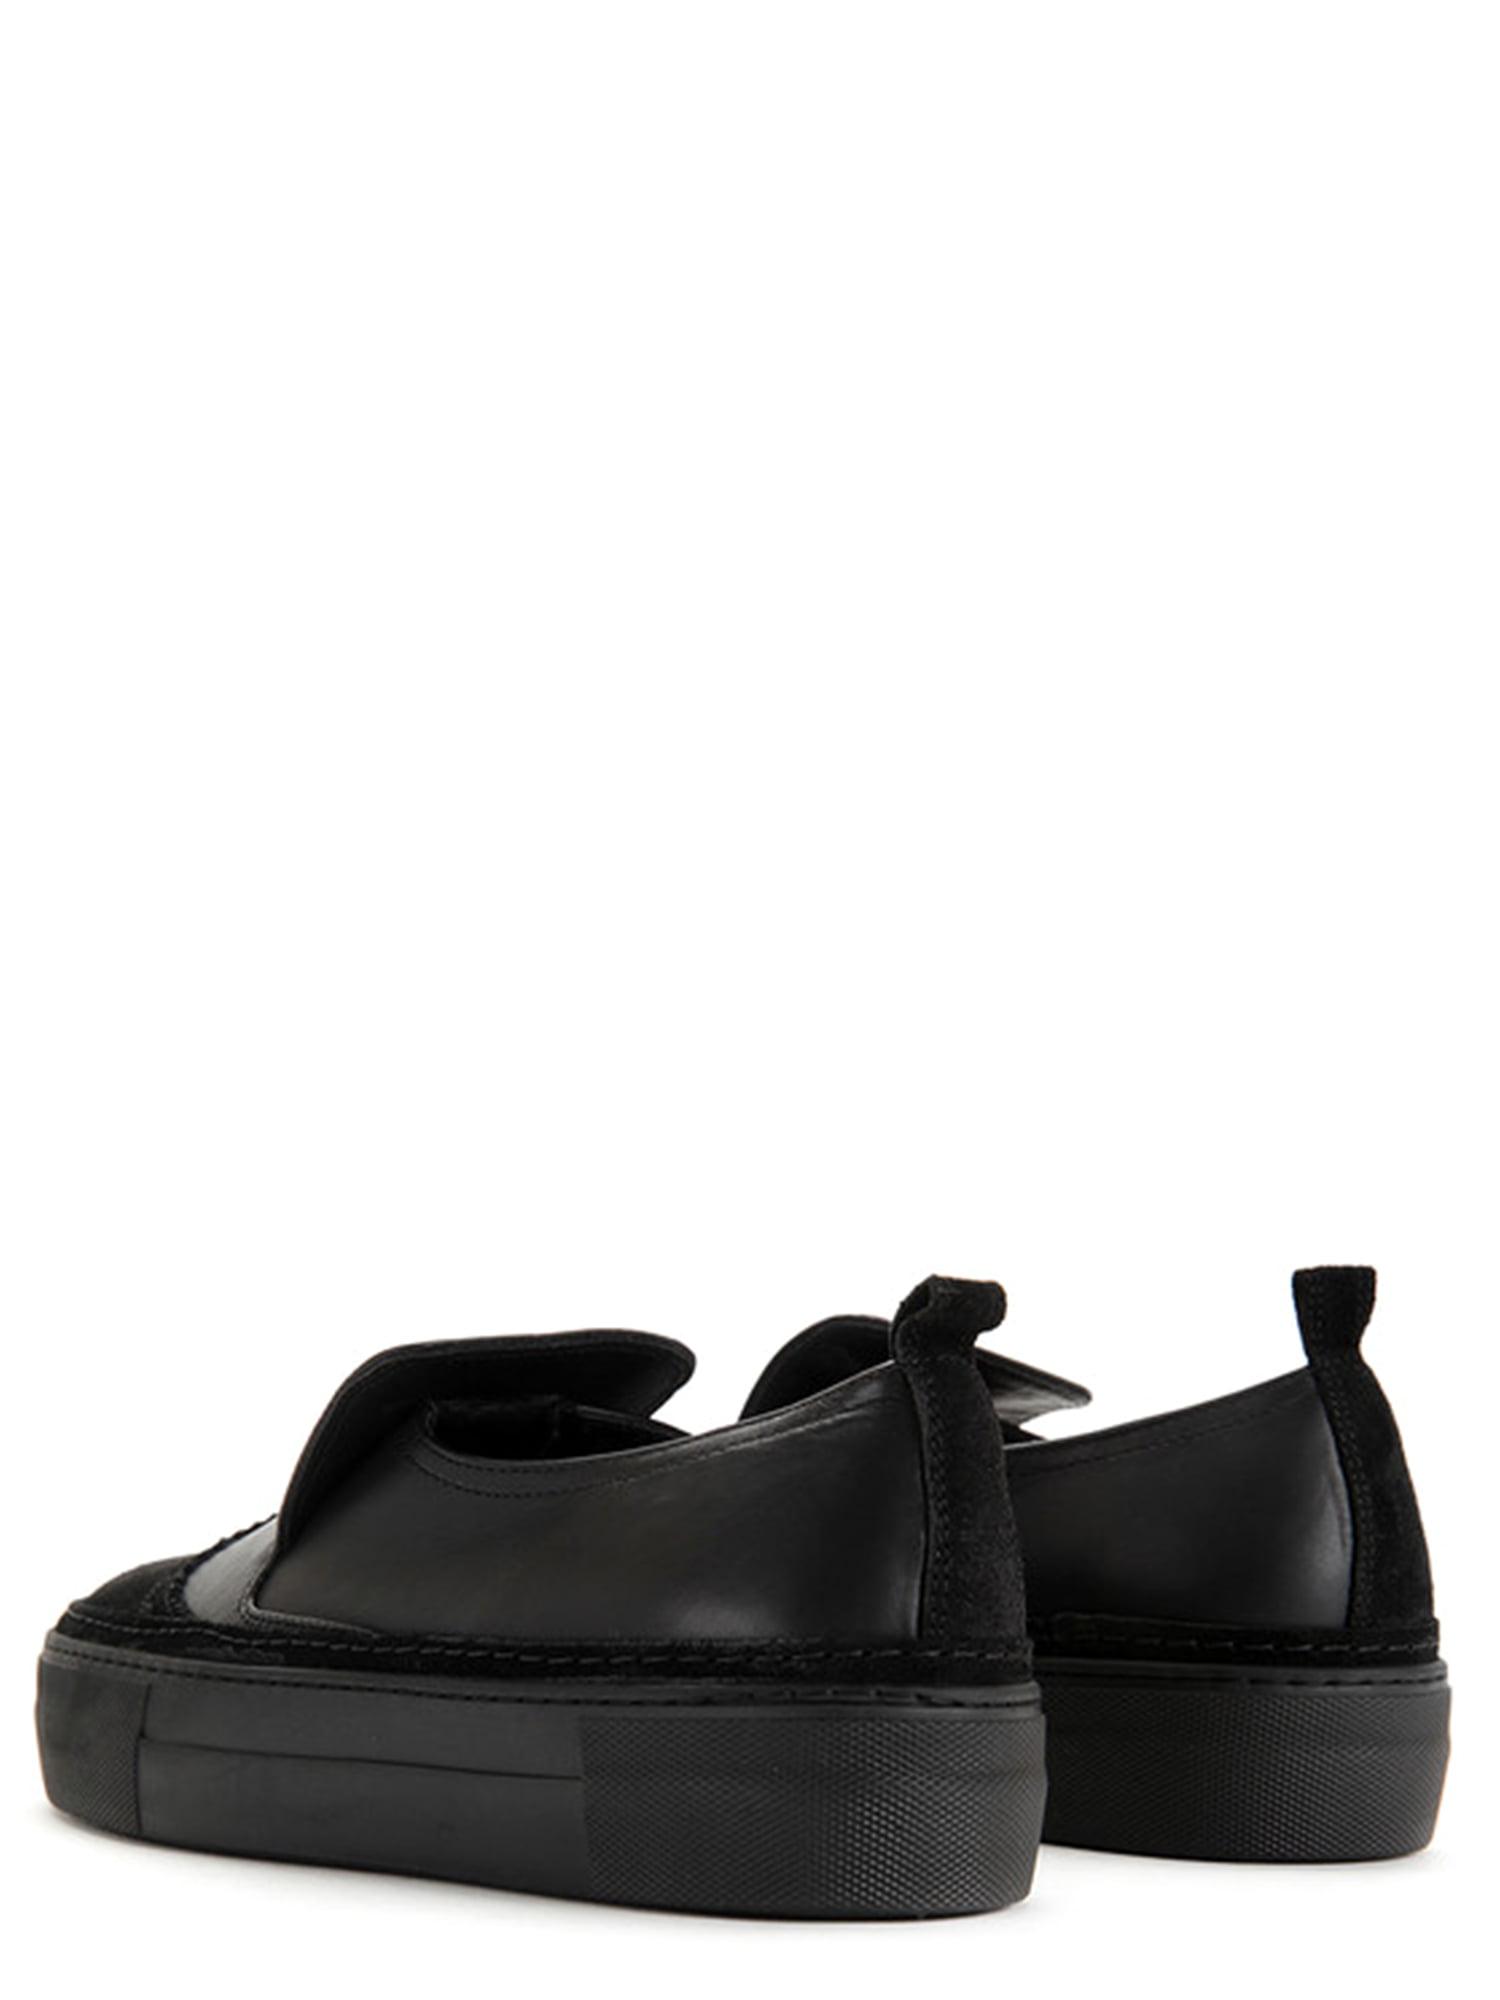 Ann Sneakers Demeulemeester Women's Platform Slip-On Sneakers Ann 152-4434-362 d936c3